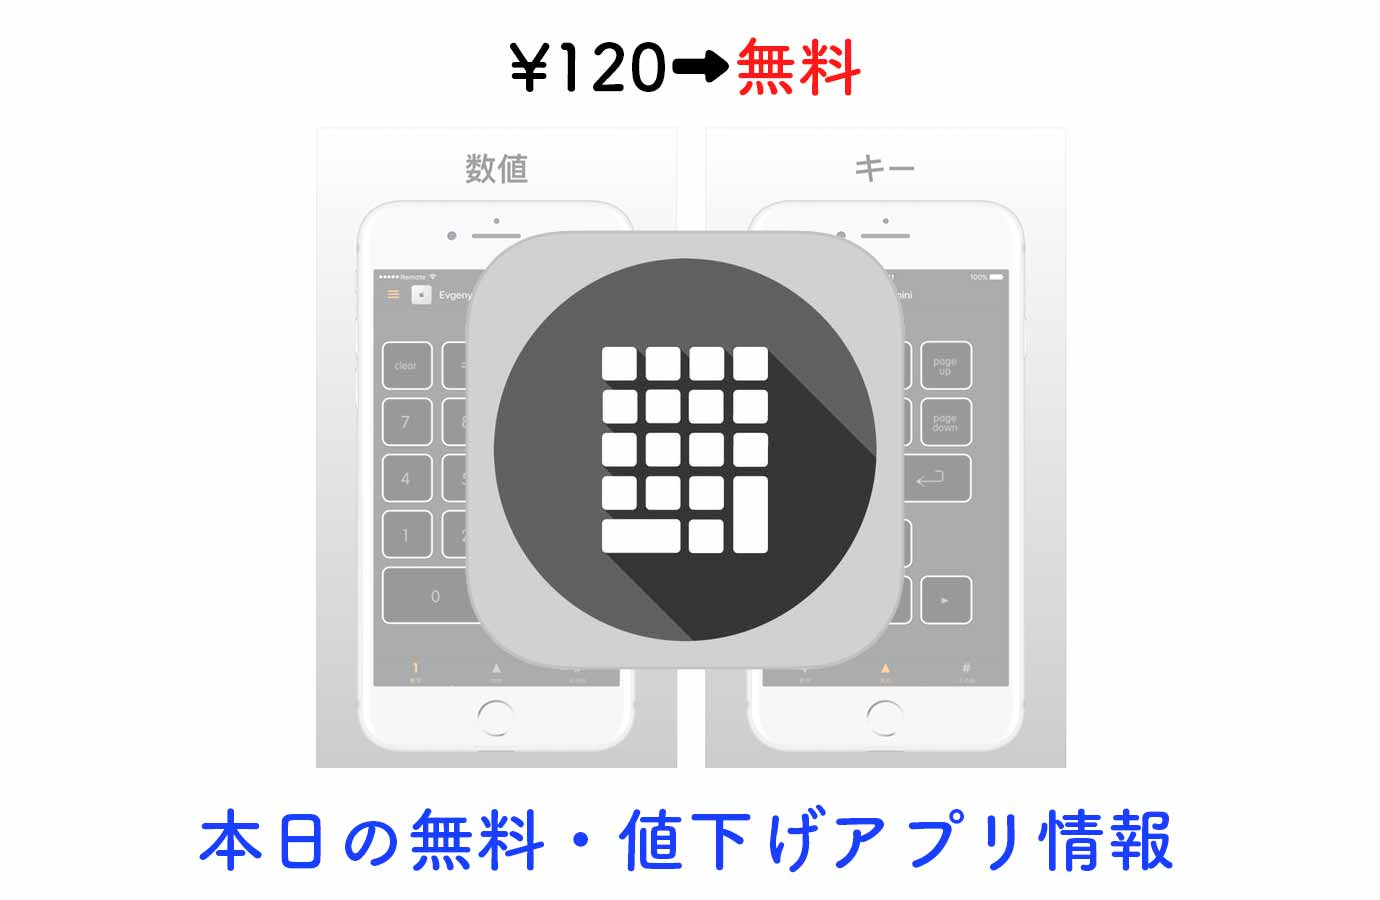 Appsale0824